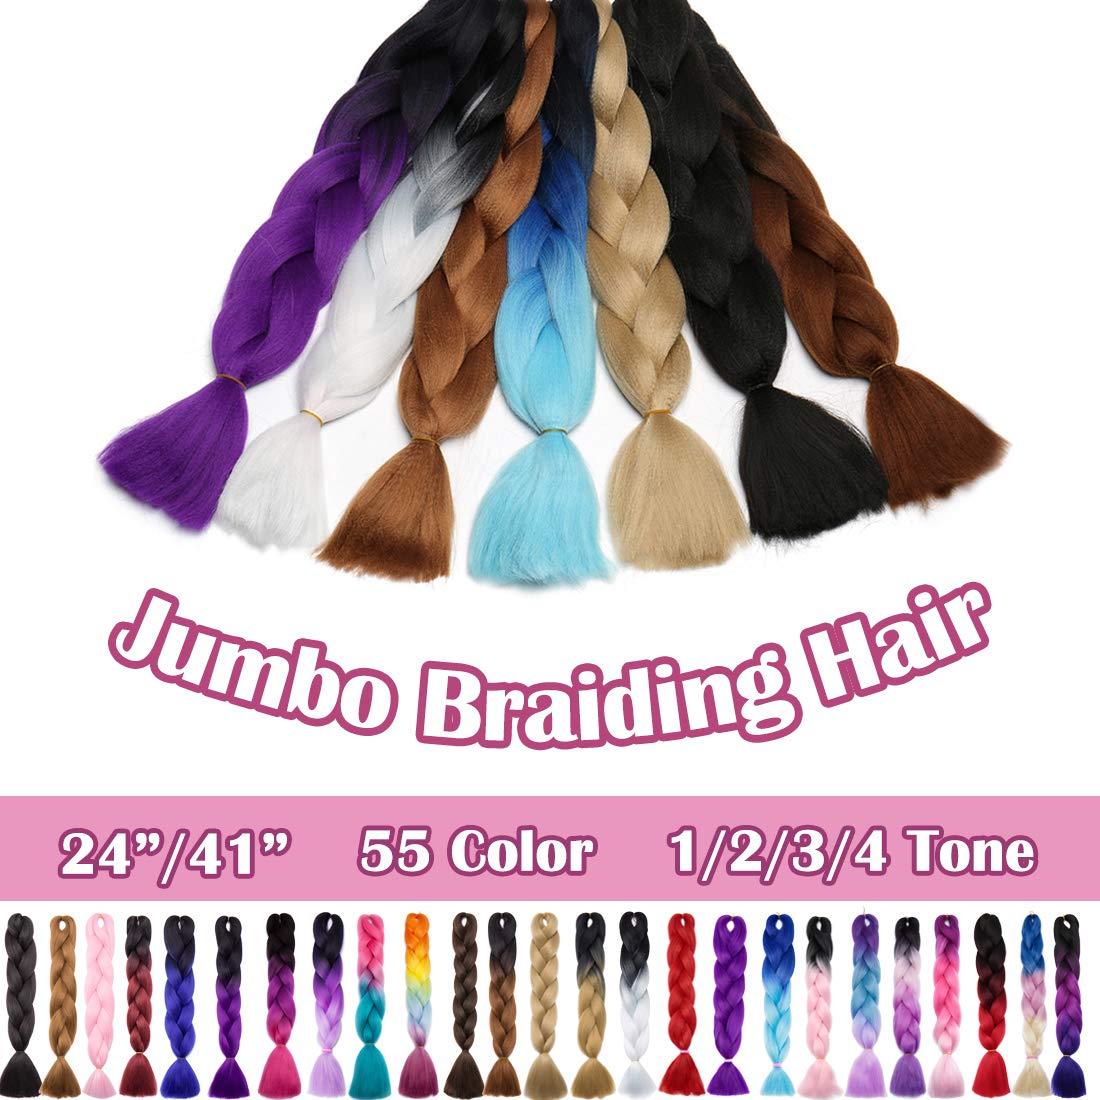 SEGO 24 Inch Ombre Jumbo Braiding Hair Jumbo Braid Hair Extensions Long Jumbo Braids for Box Braids Crochet Hair High Temperature Synthetic Fiber 2 Tone Colored Black/Dark Purple 3 Bundle